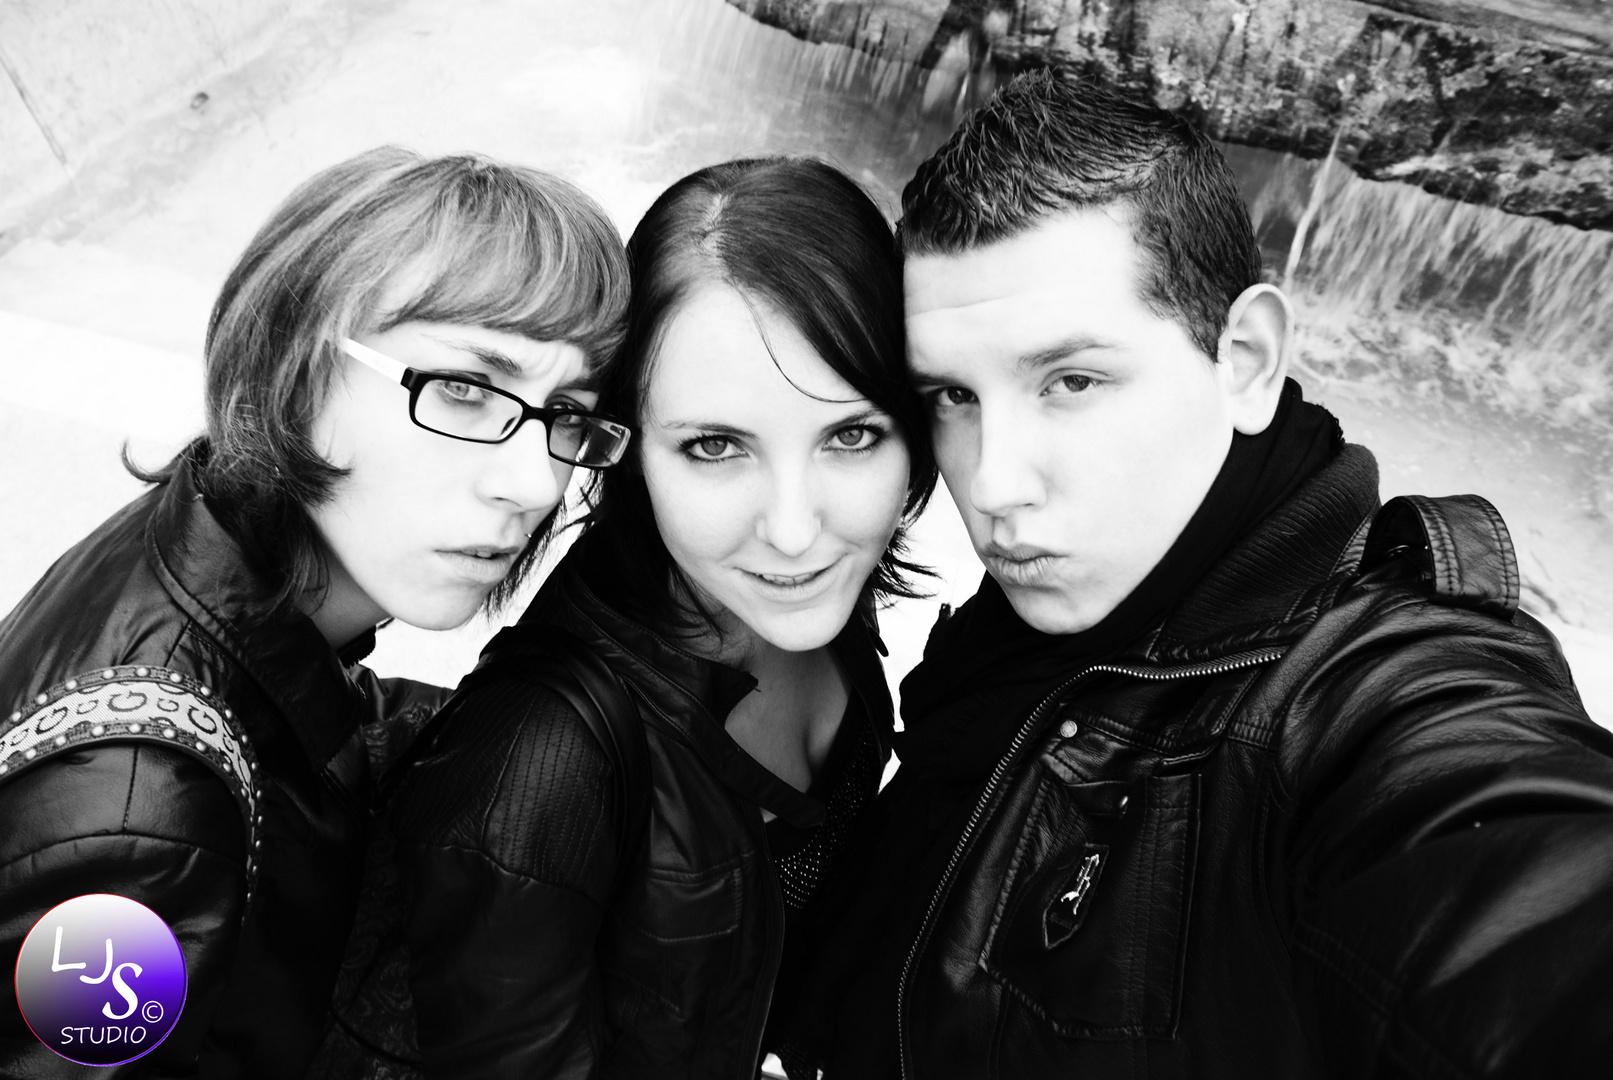 Friends - Amis